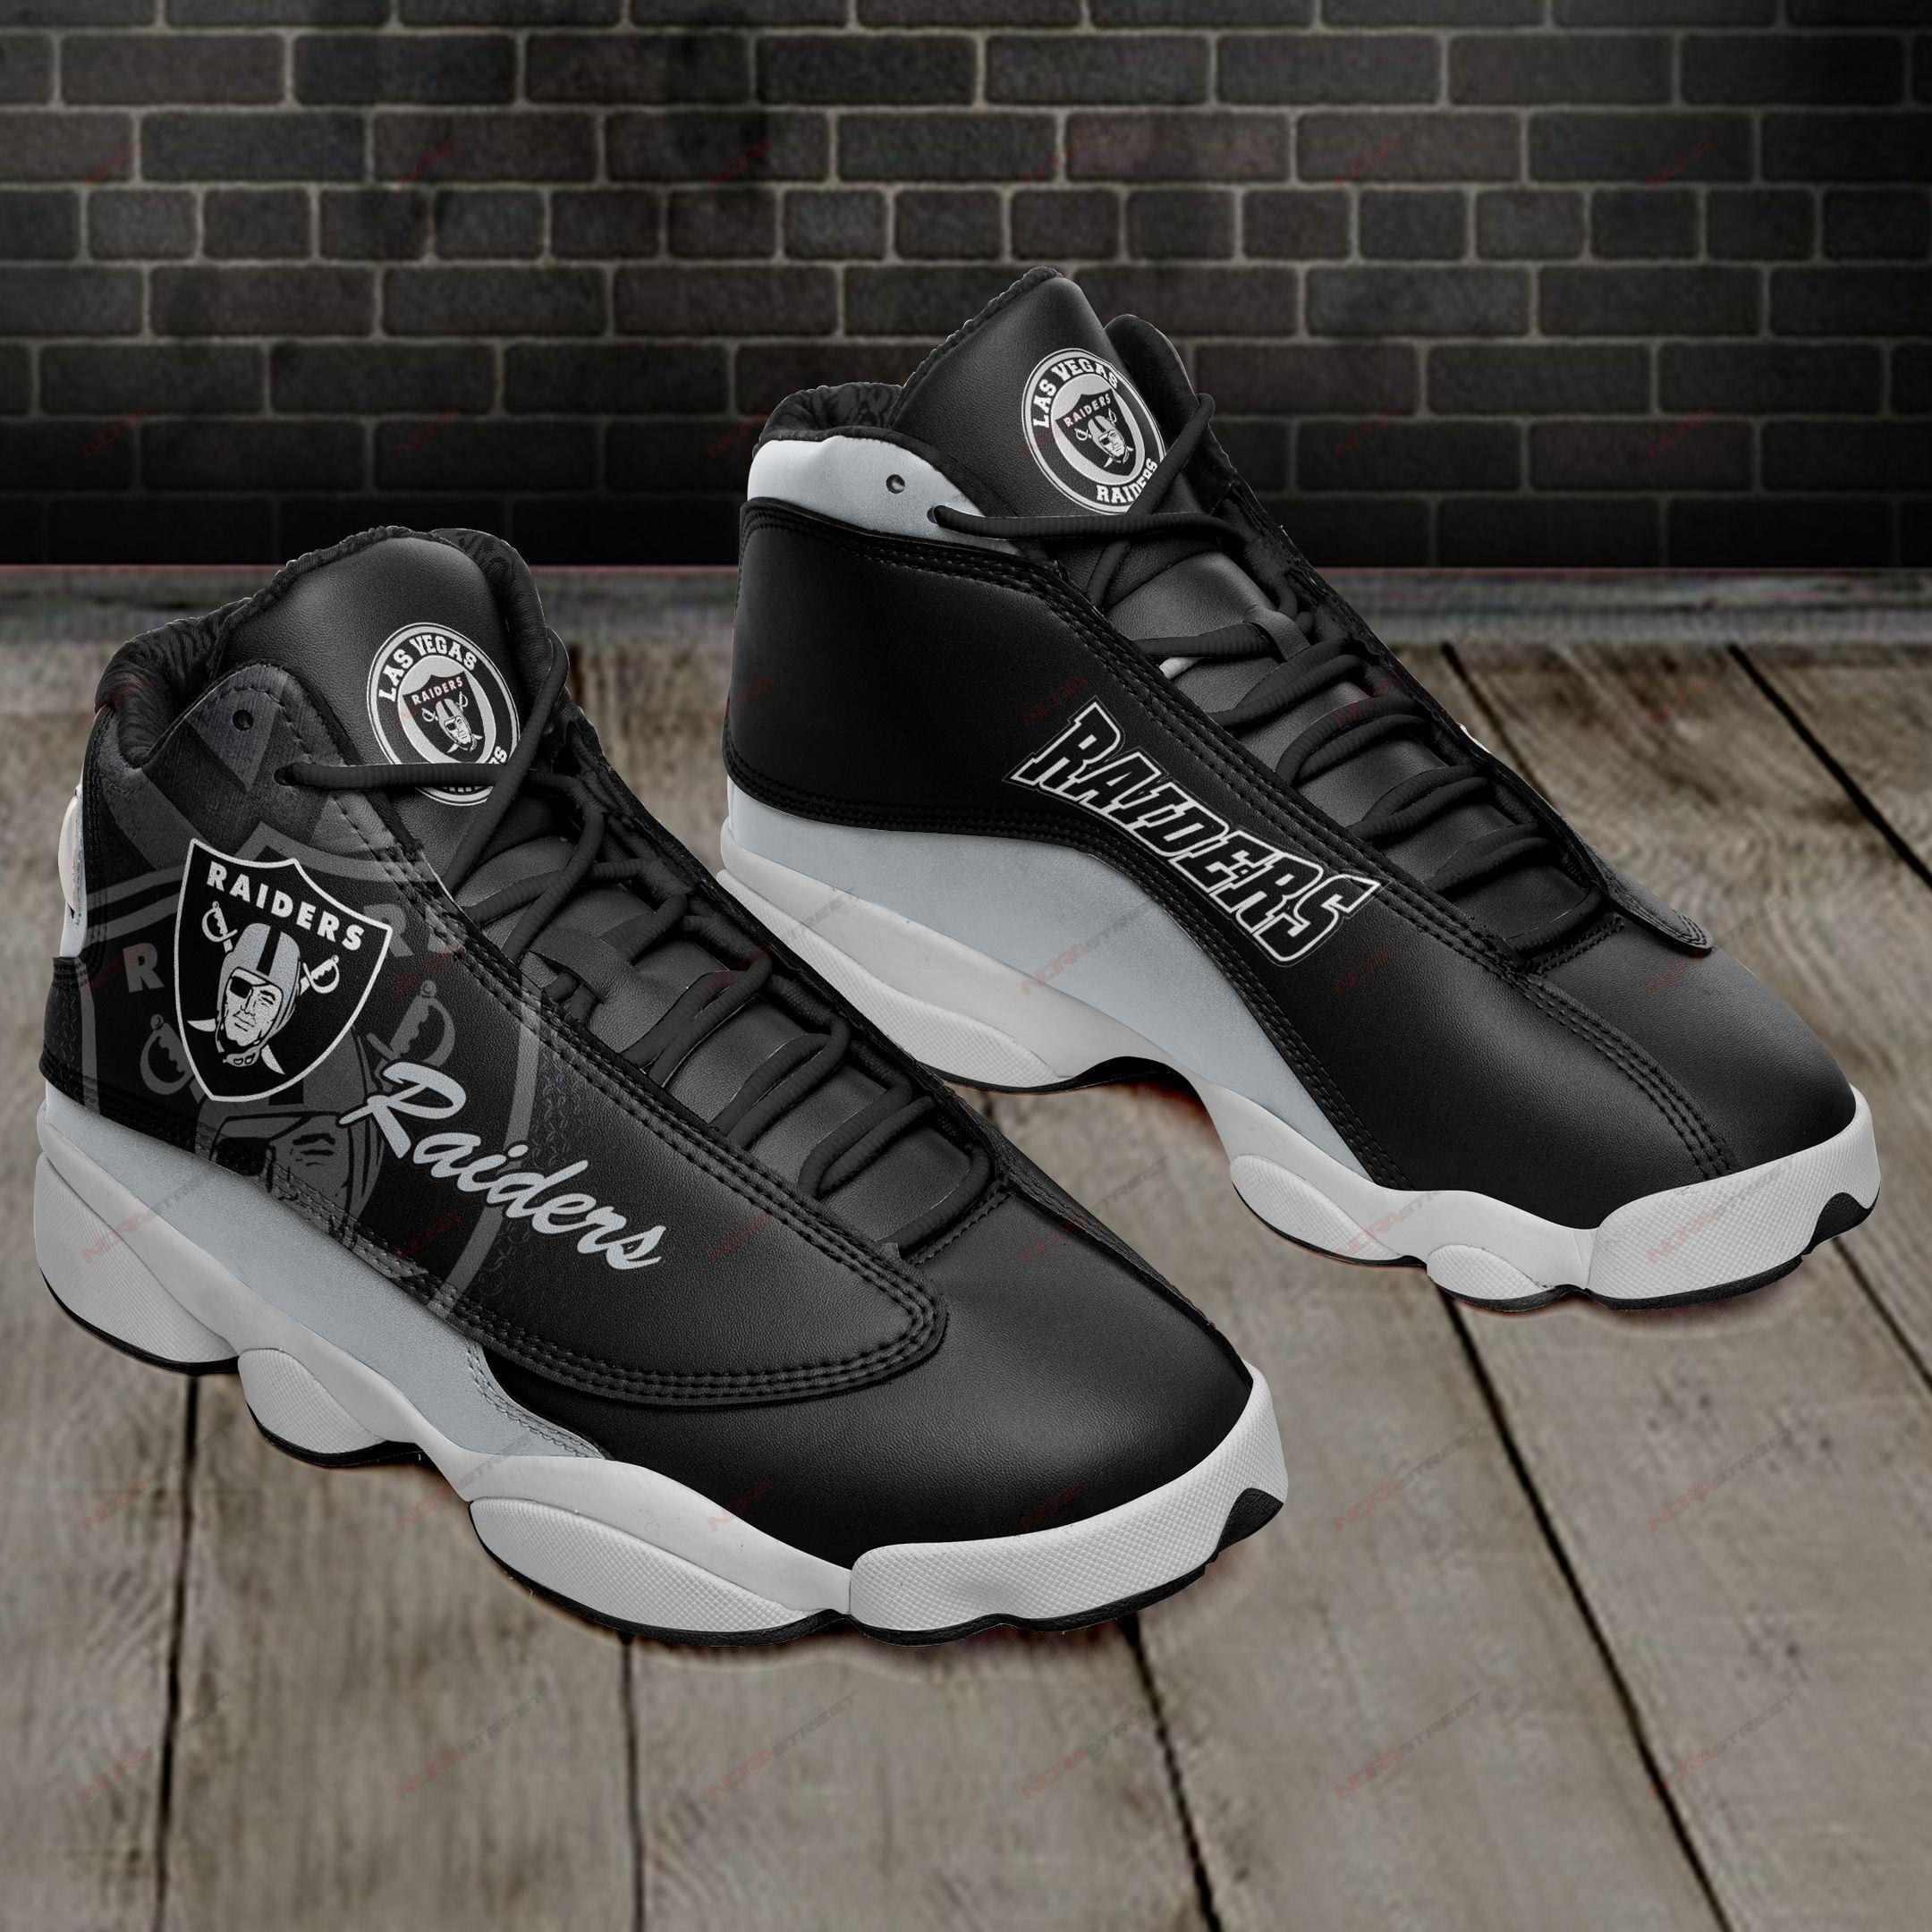 Oakland Raiders Air Jordan 13 Sneakers Sport Shoes Full Size